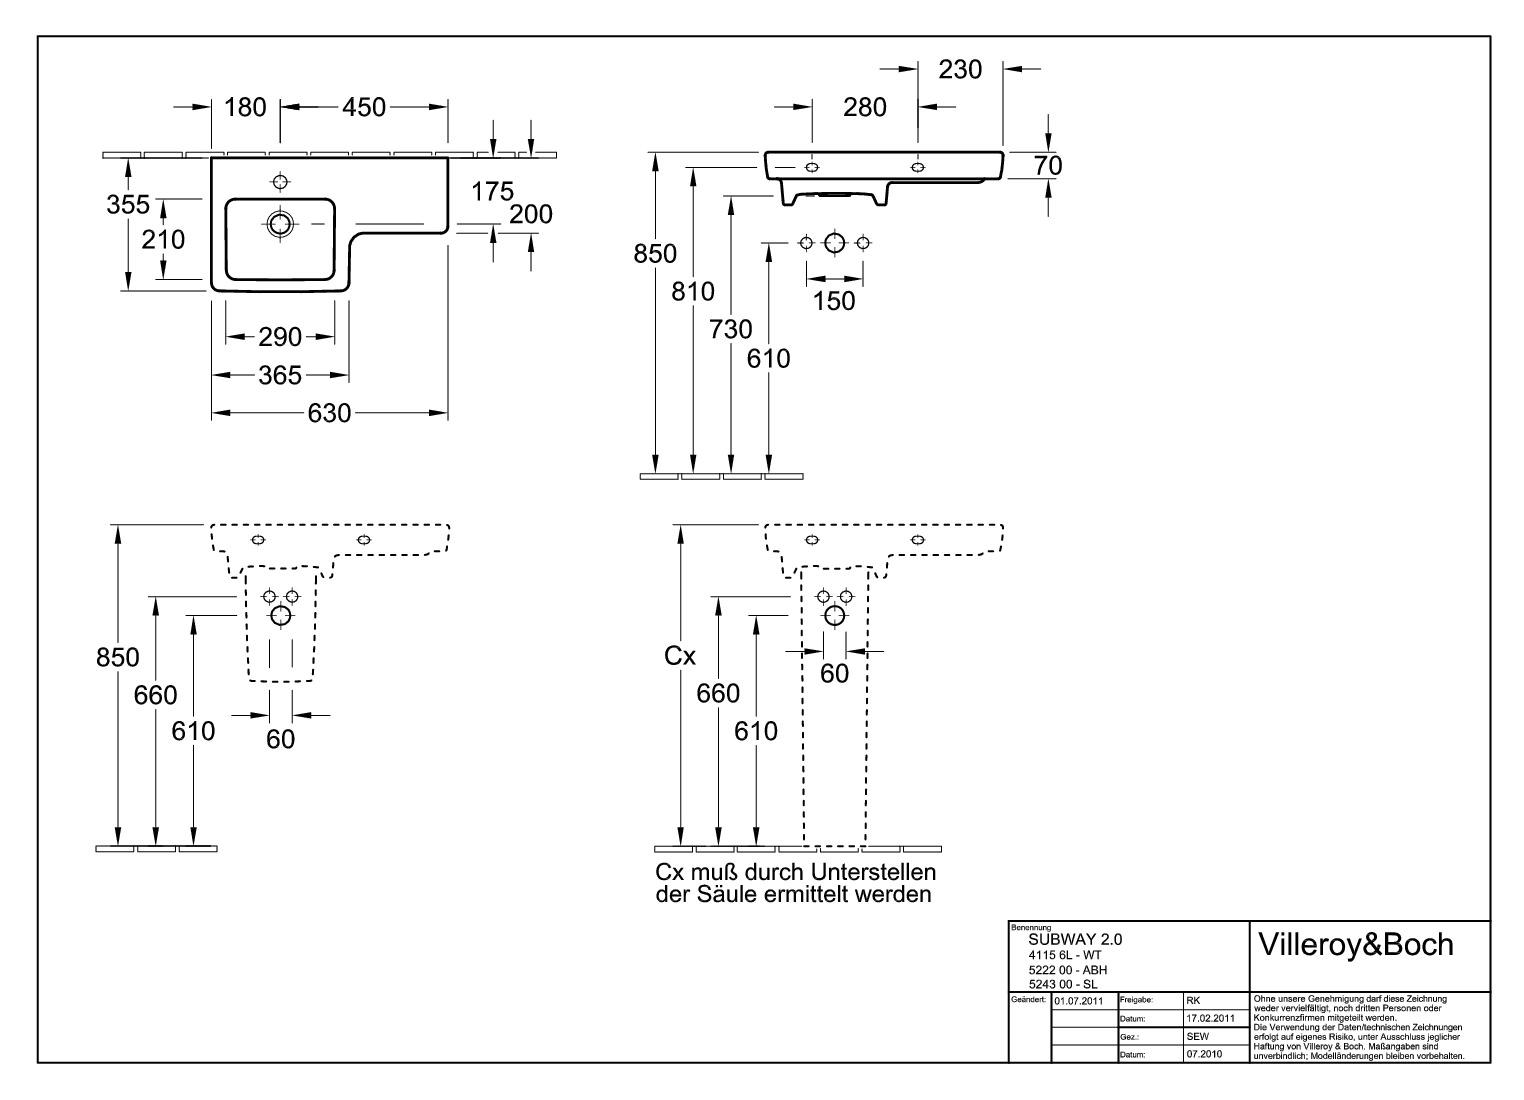 villeroy boch avento subway 2 0 und legato ablaufhaube halbs ule wei alpin 52220001. Black Bedroom Furniture Sets. Home Design Ideas